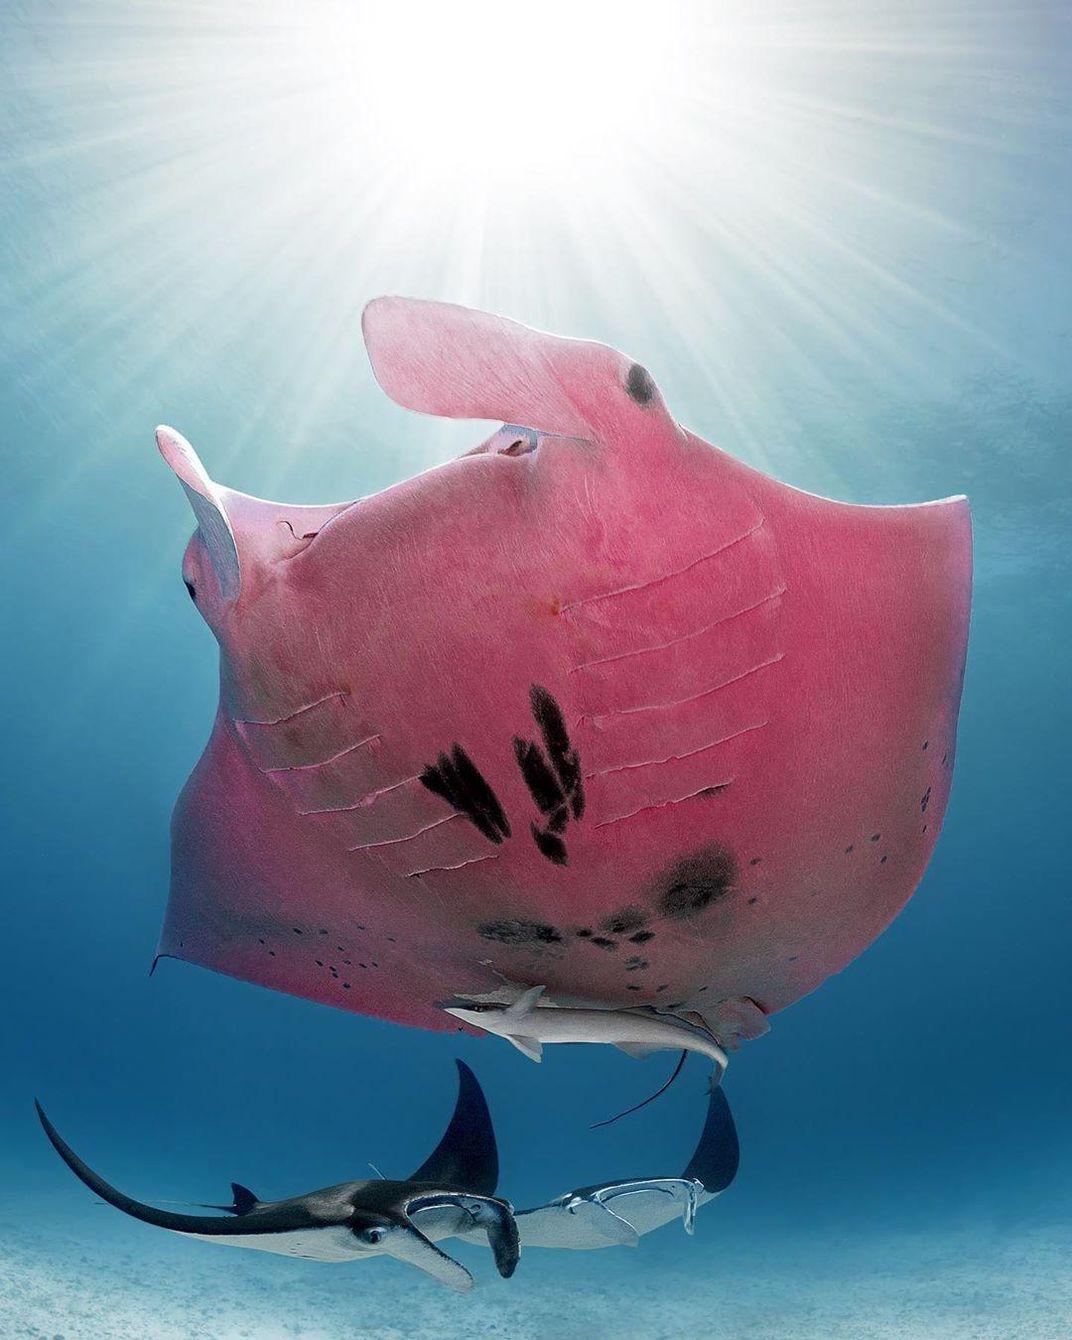 Rare Pink Manta Ray Spotted Near Australia's Lady Elliot Island